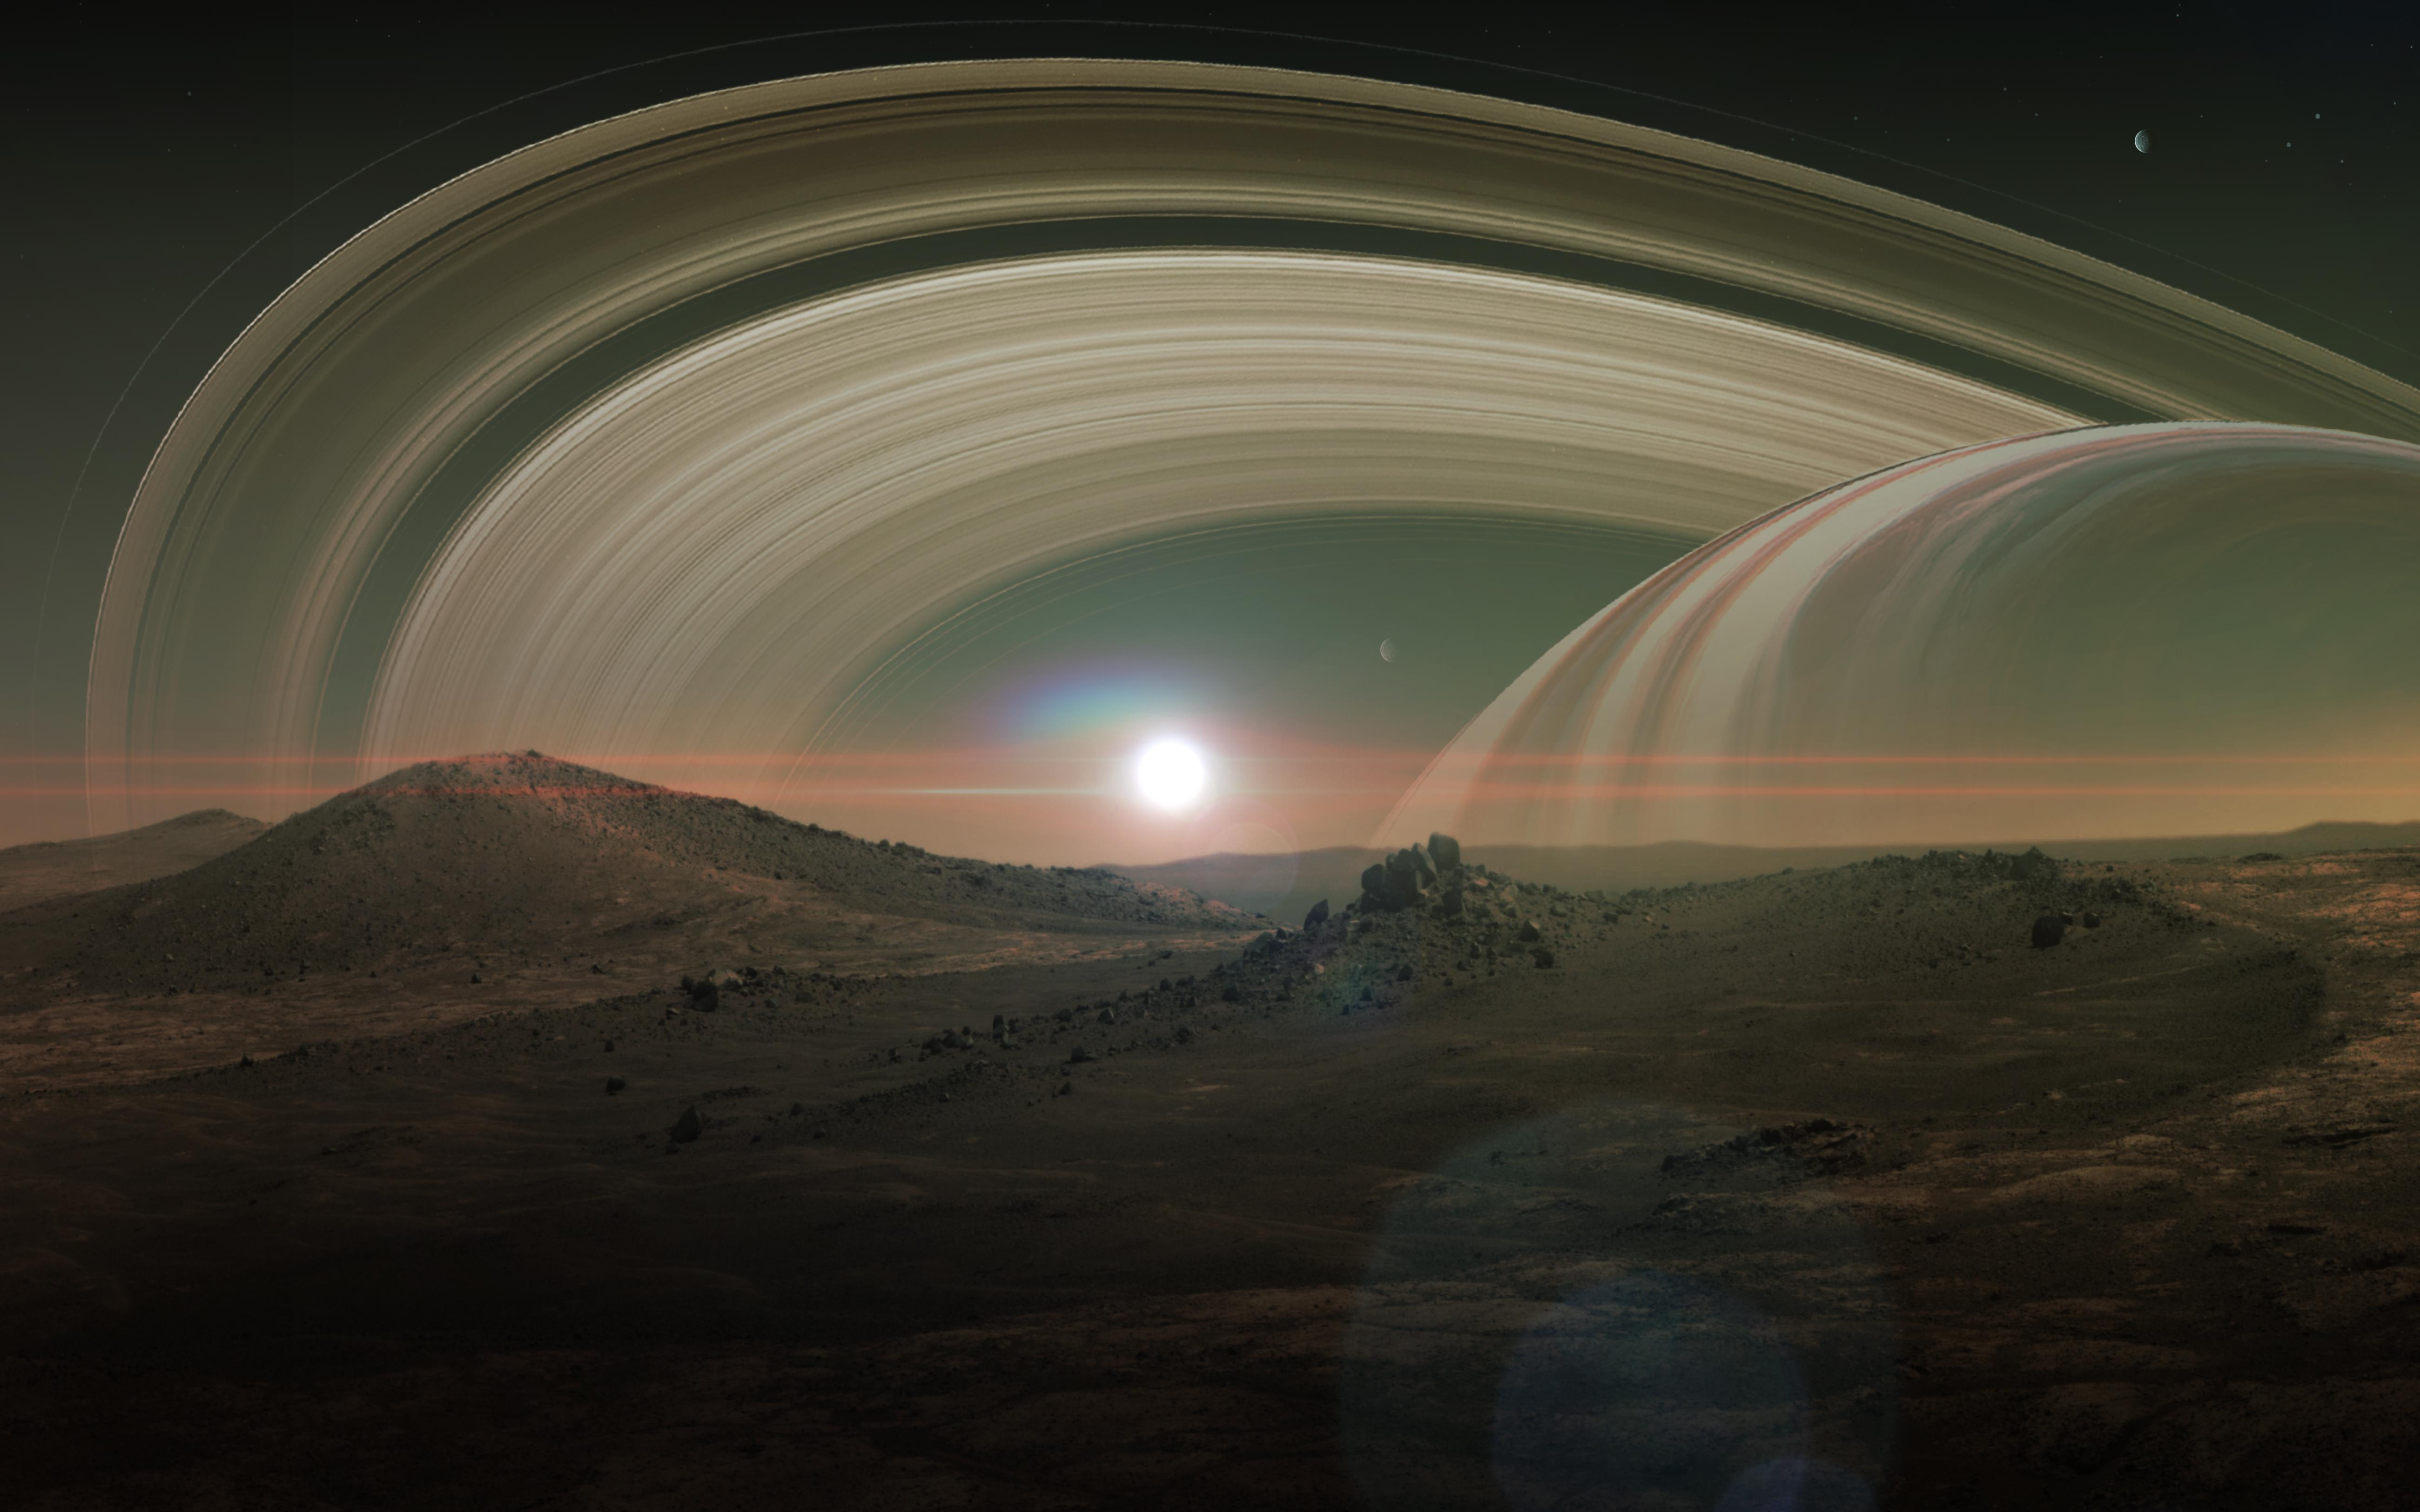 Сатурн планета фото со спутника